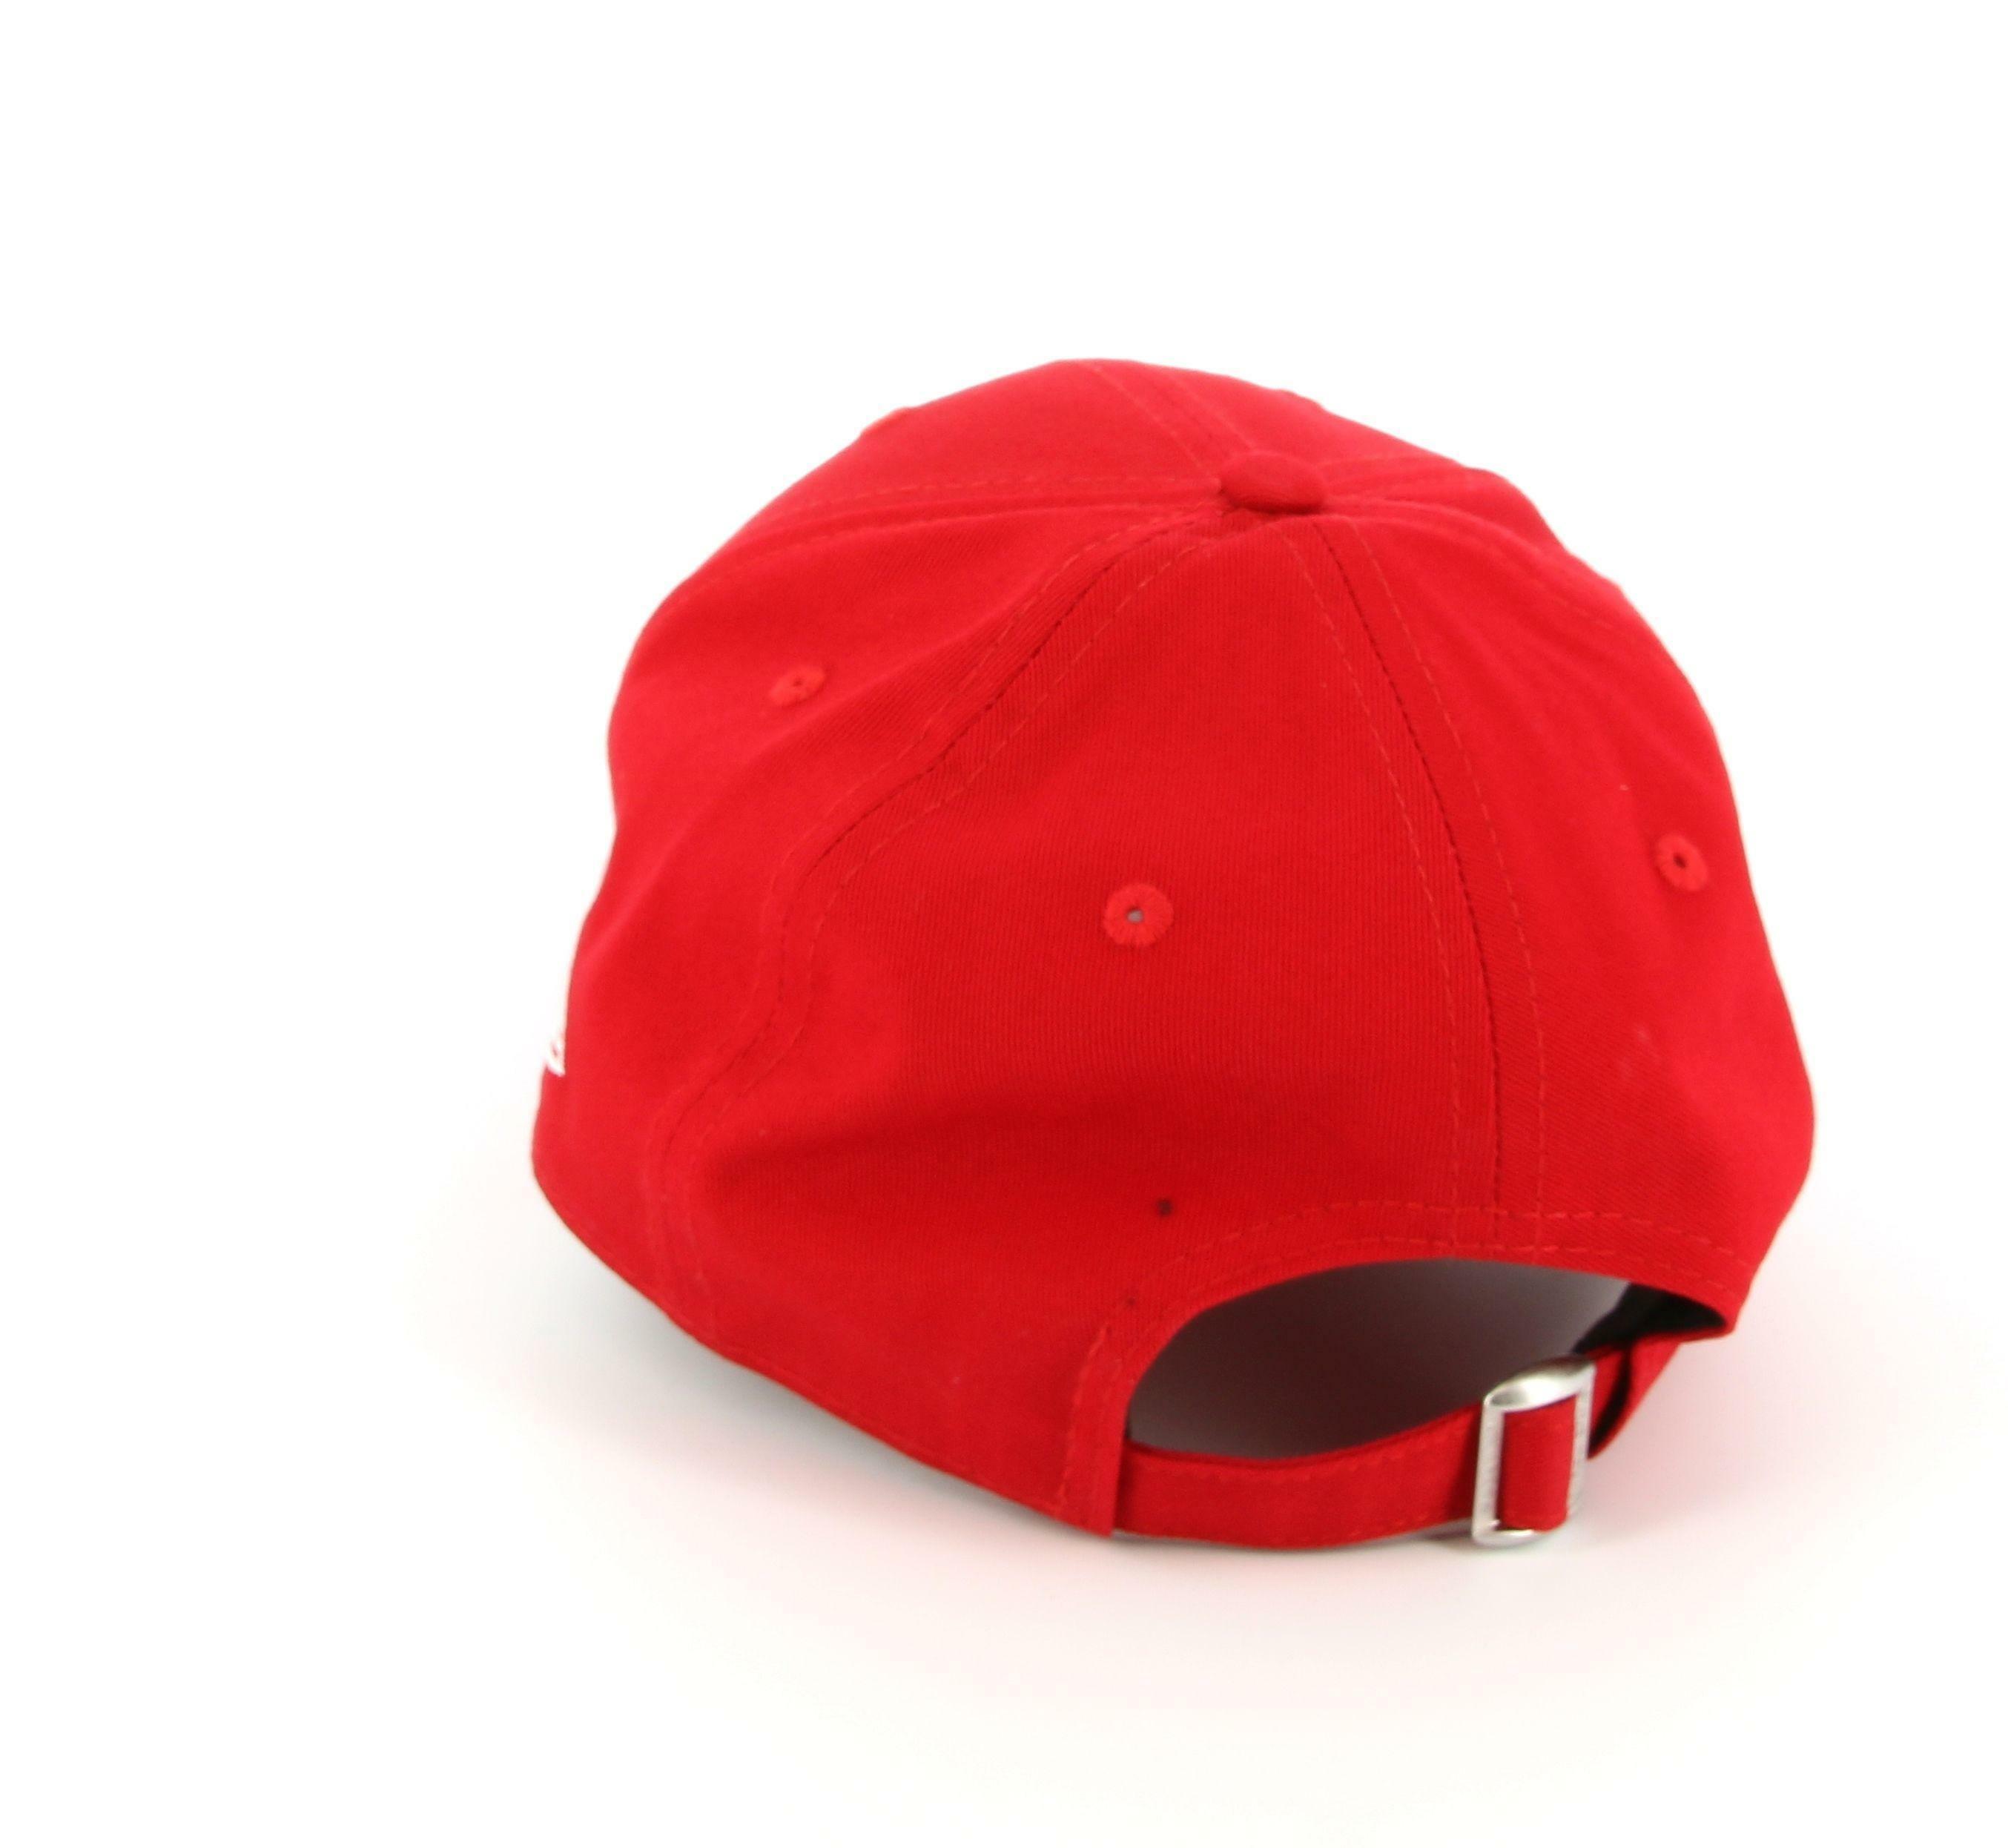 new era new era 10531938 cappello unisex scarlet/white